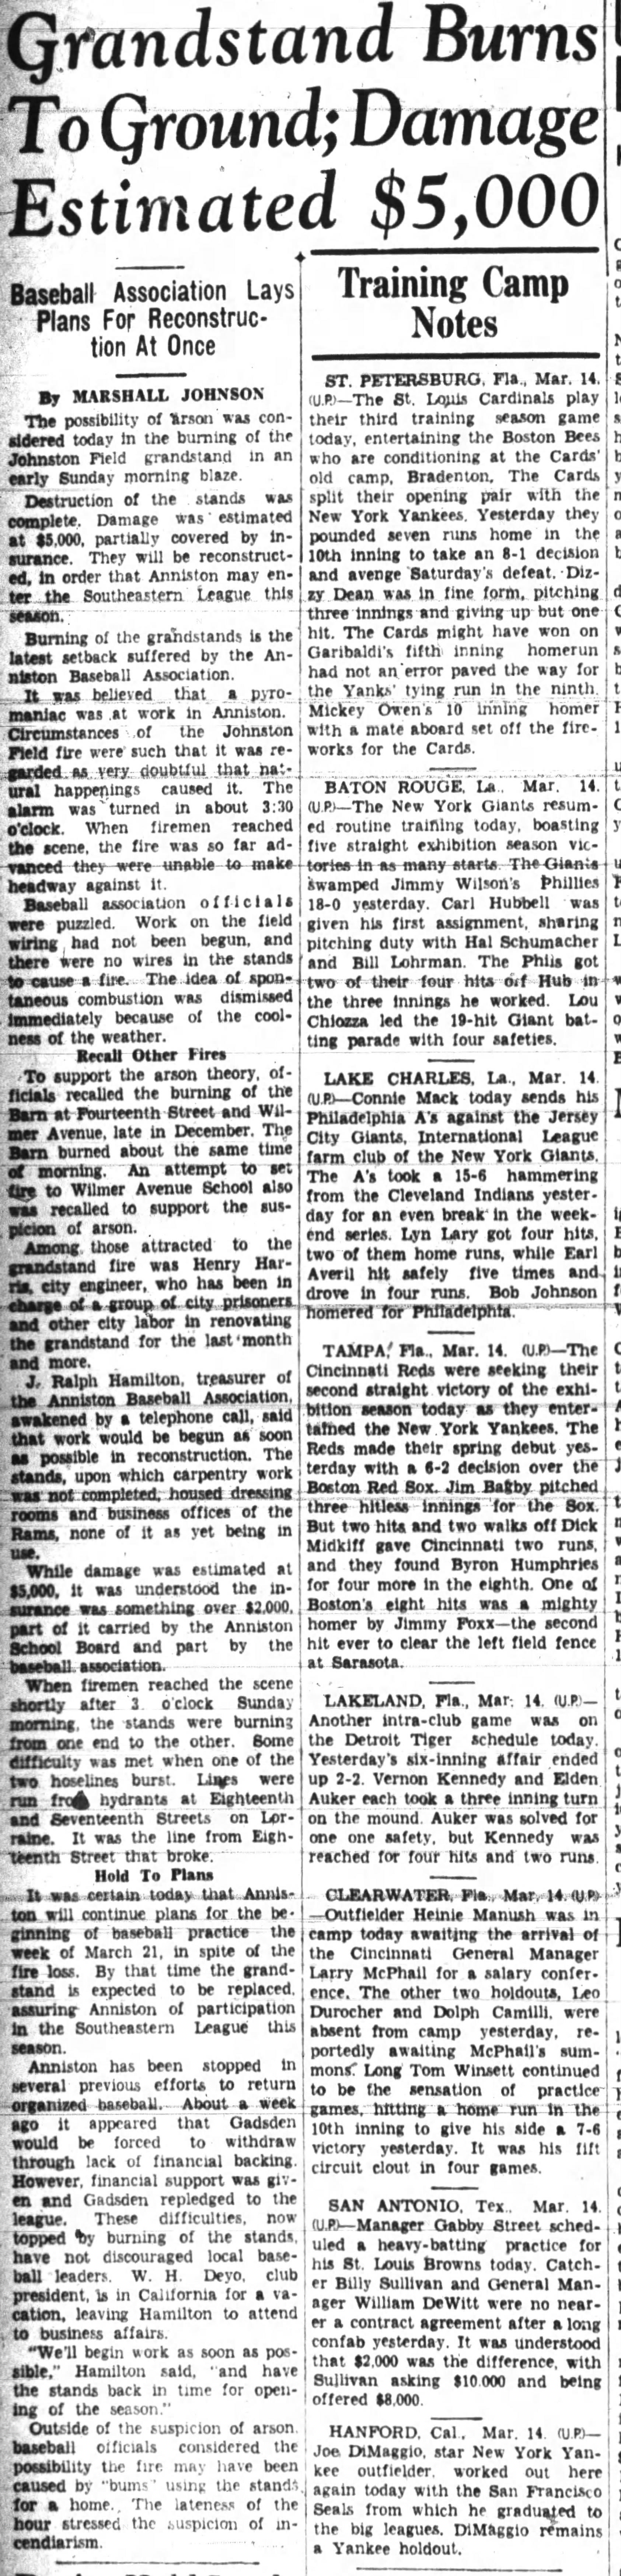 The_Anniston_Star_Mon__Mar_14__1938_